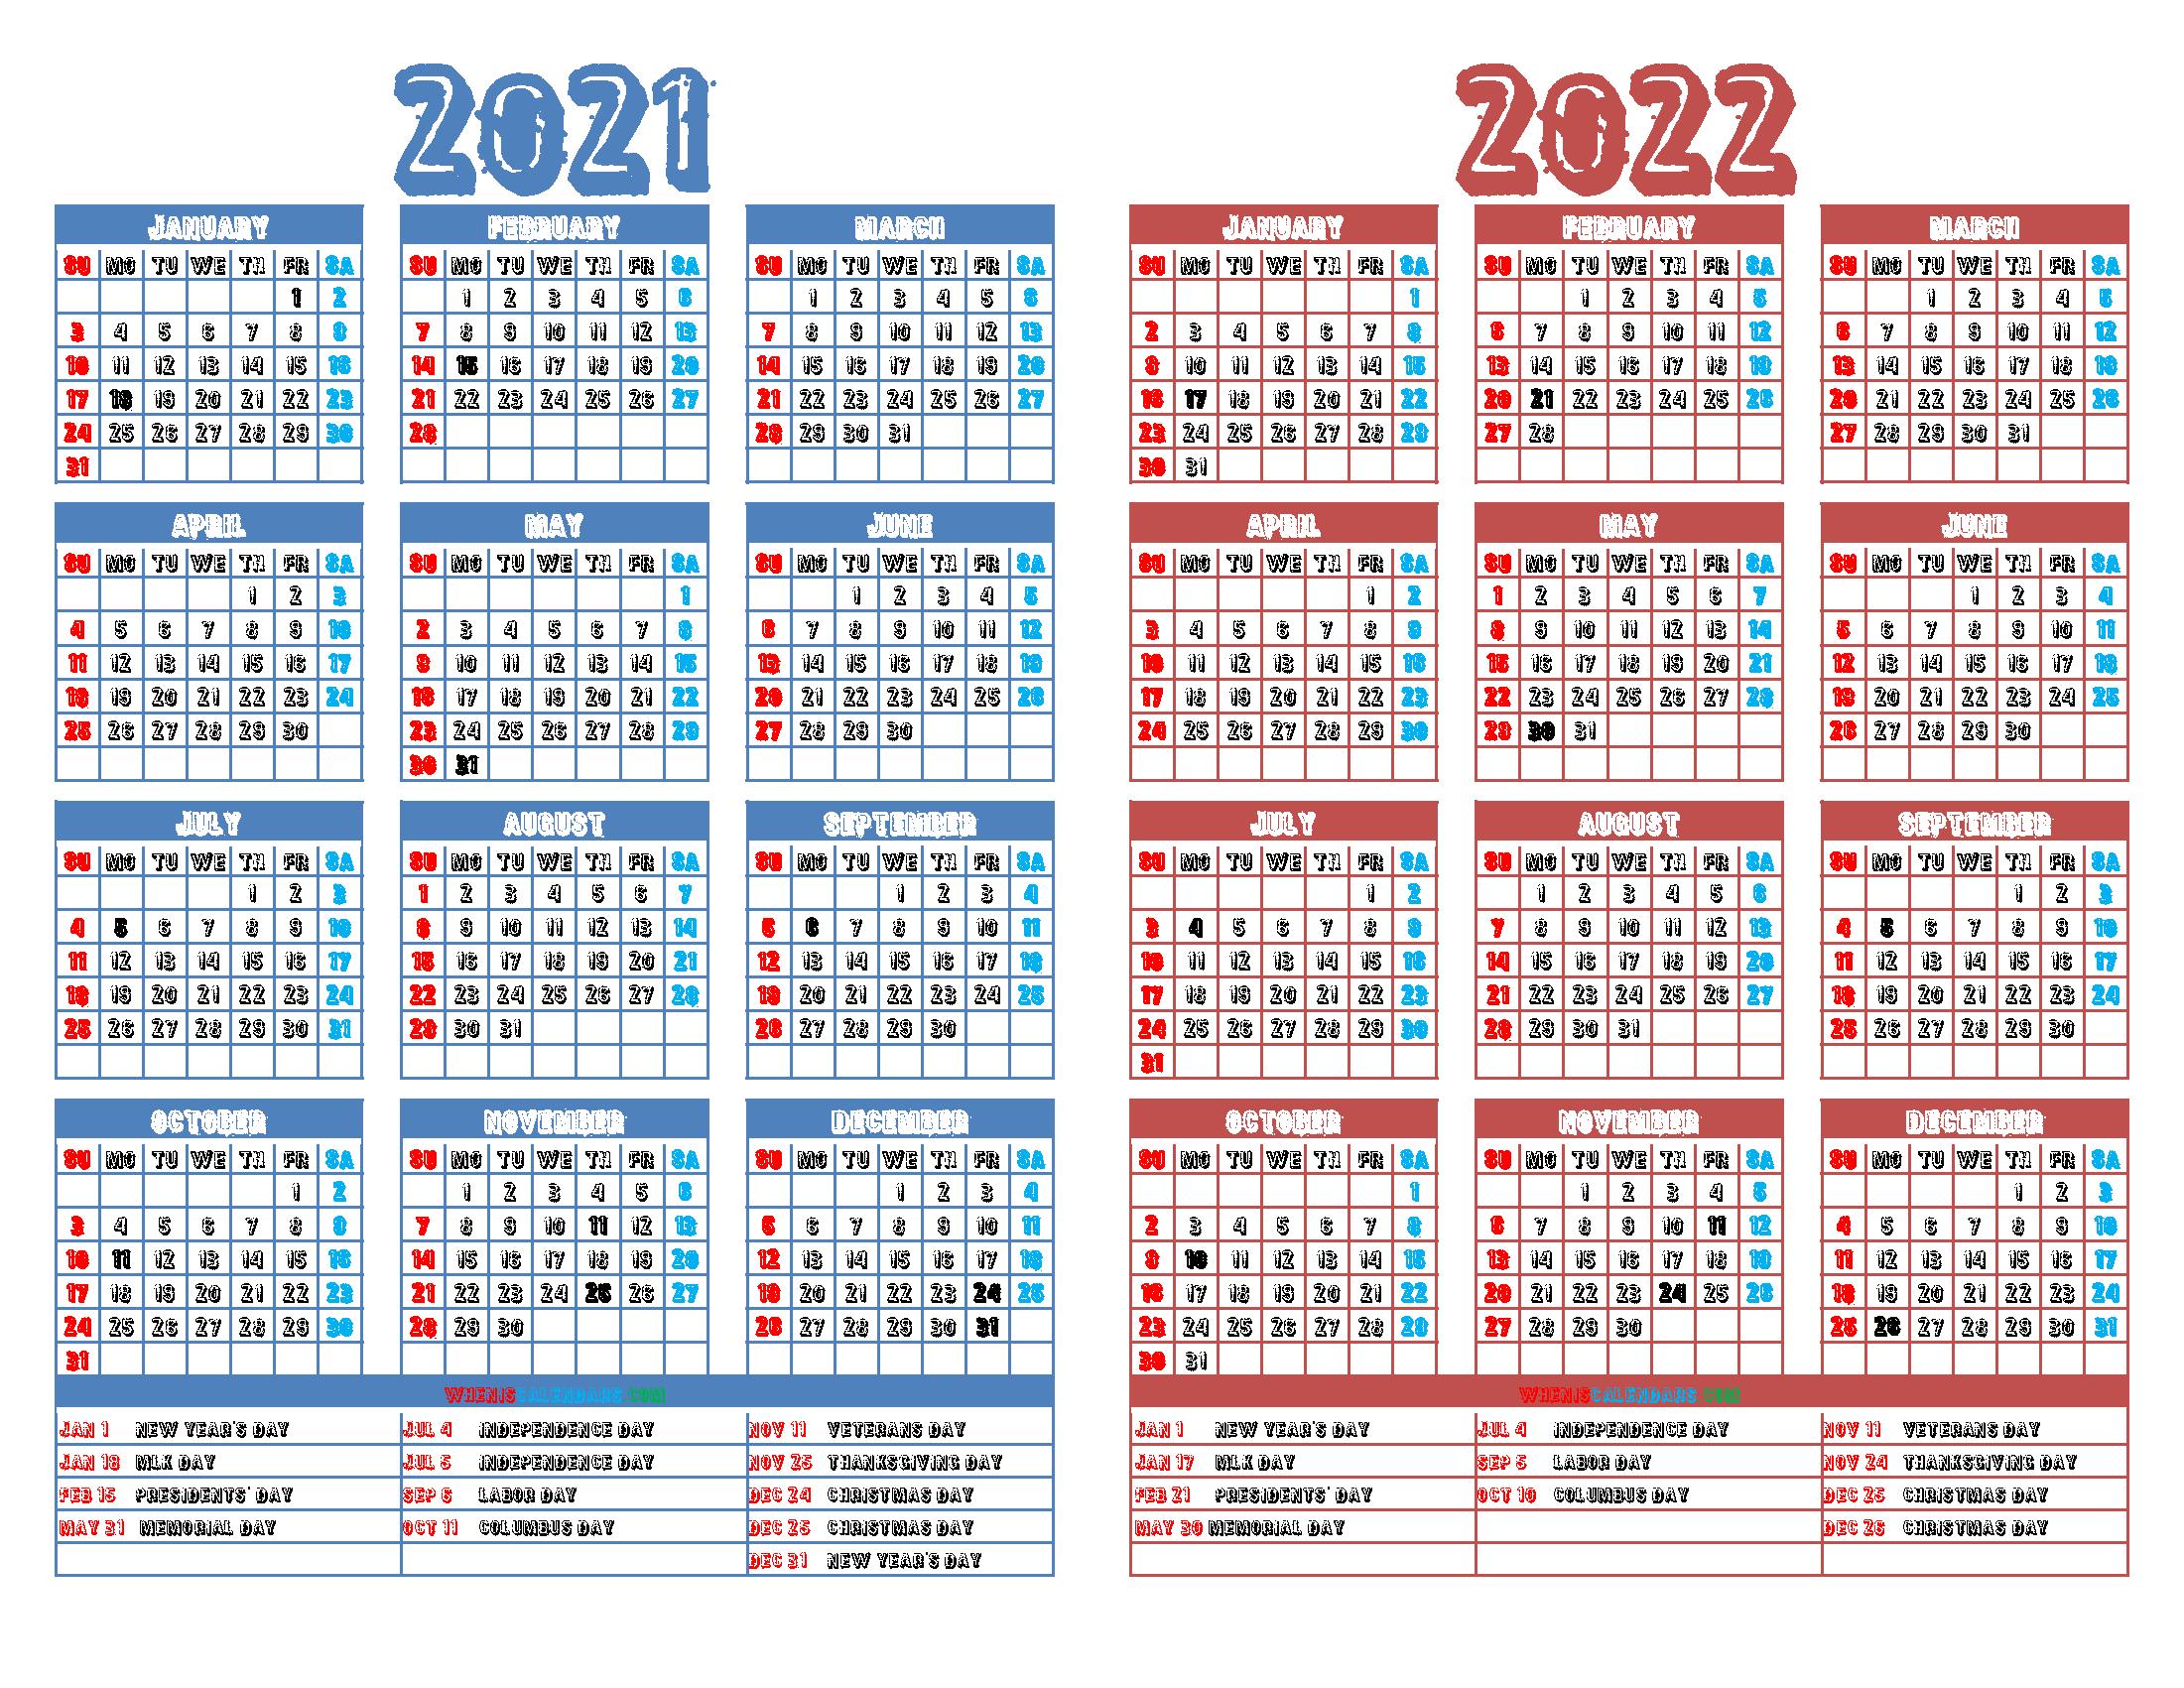 Printable 2021 and 2022 Calendar with Holidays (12 Templates)